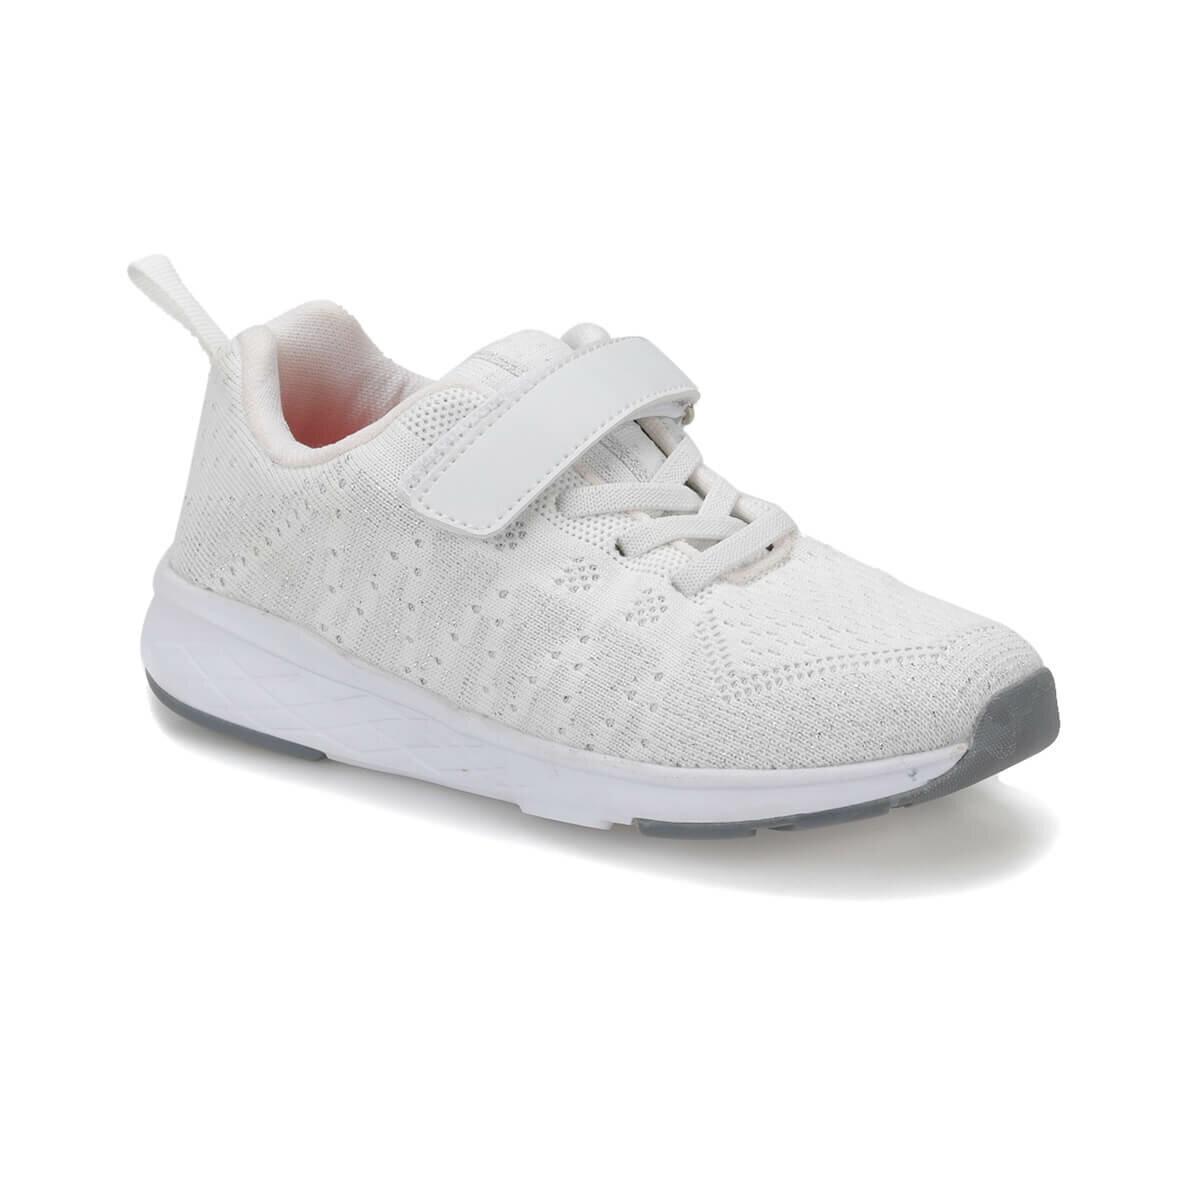 FLO FANCY White Female Child Walking Shoes I-Cool